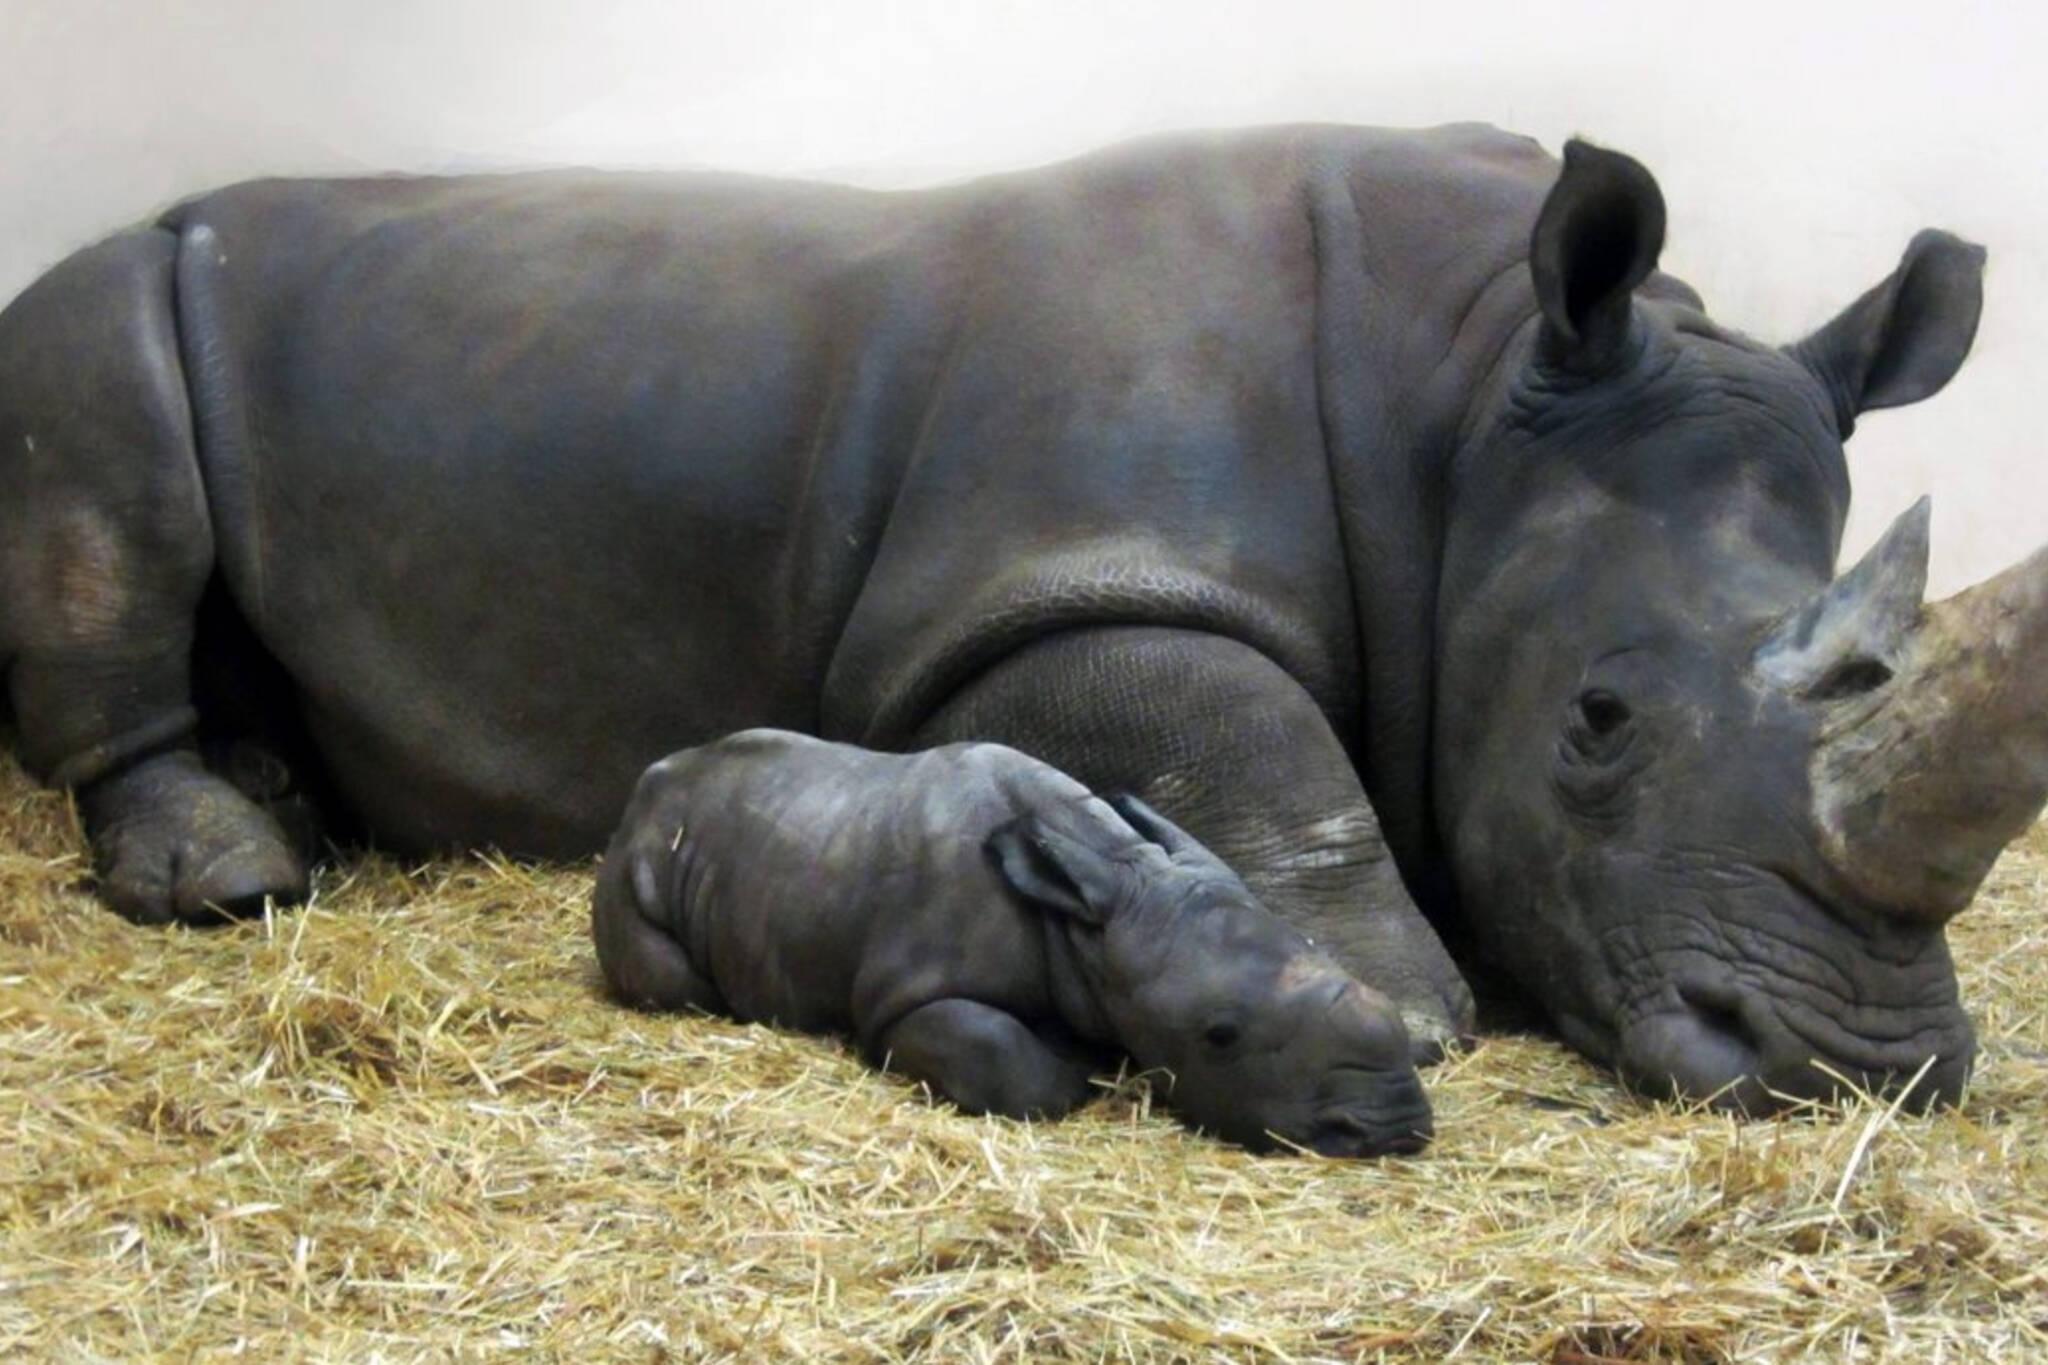 White Rhino zoo